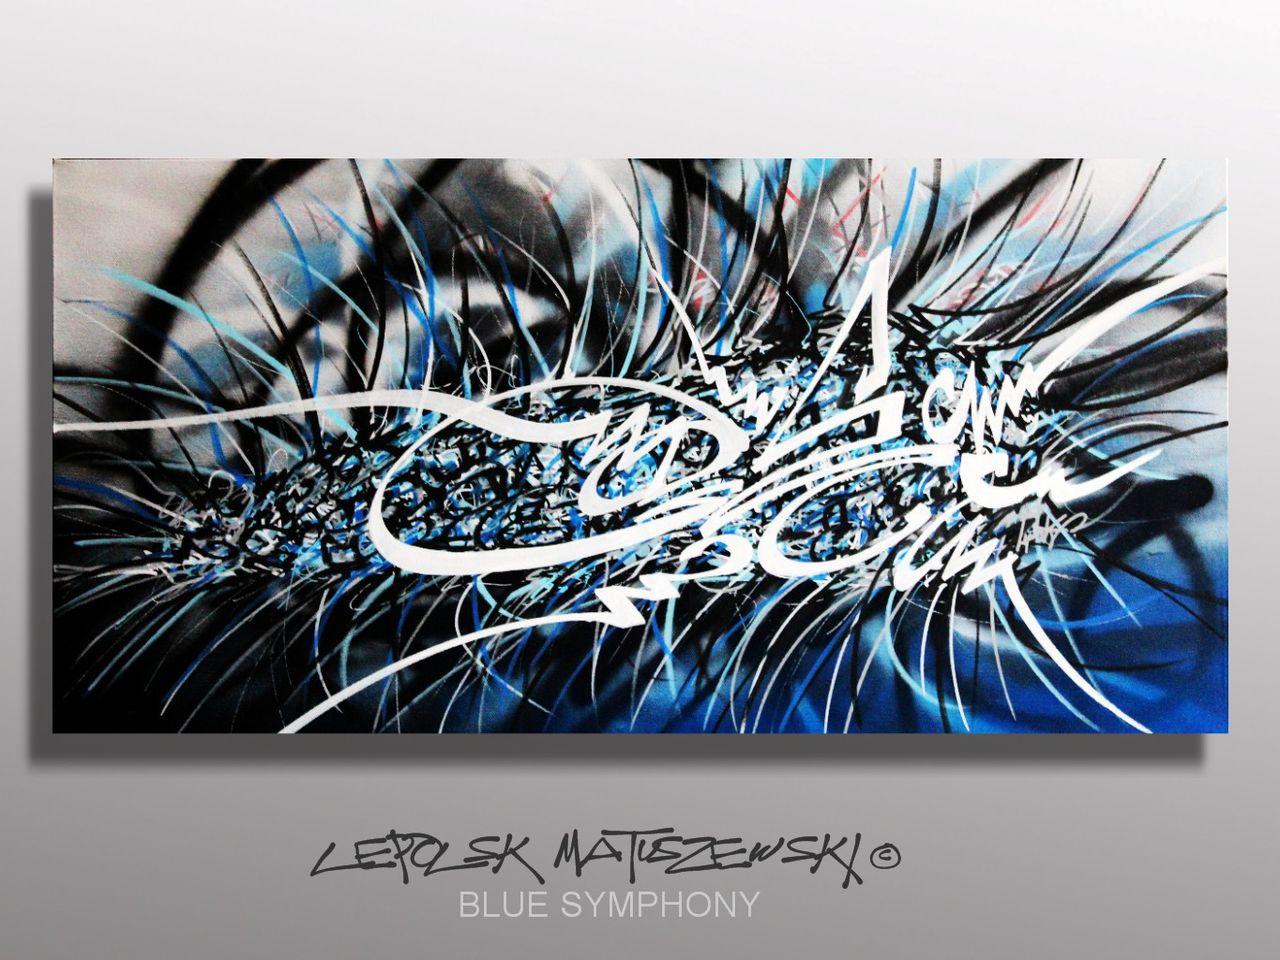 MK  Lepolsk Matuszewski DEEP BLUE SYMPHONY   street art calligraffiti graffiti abstrait